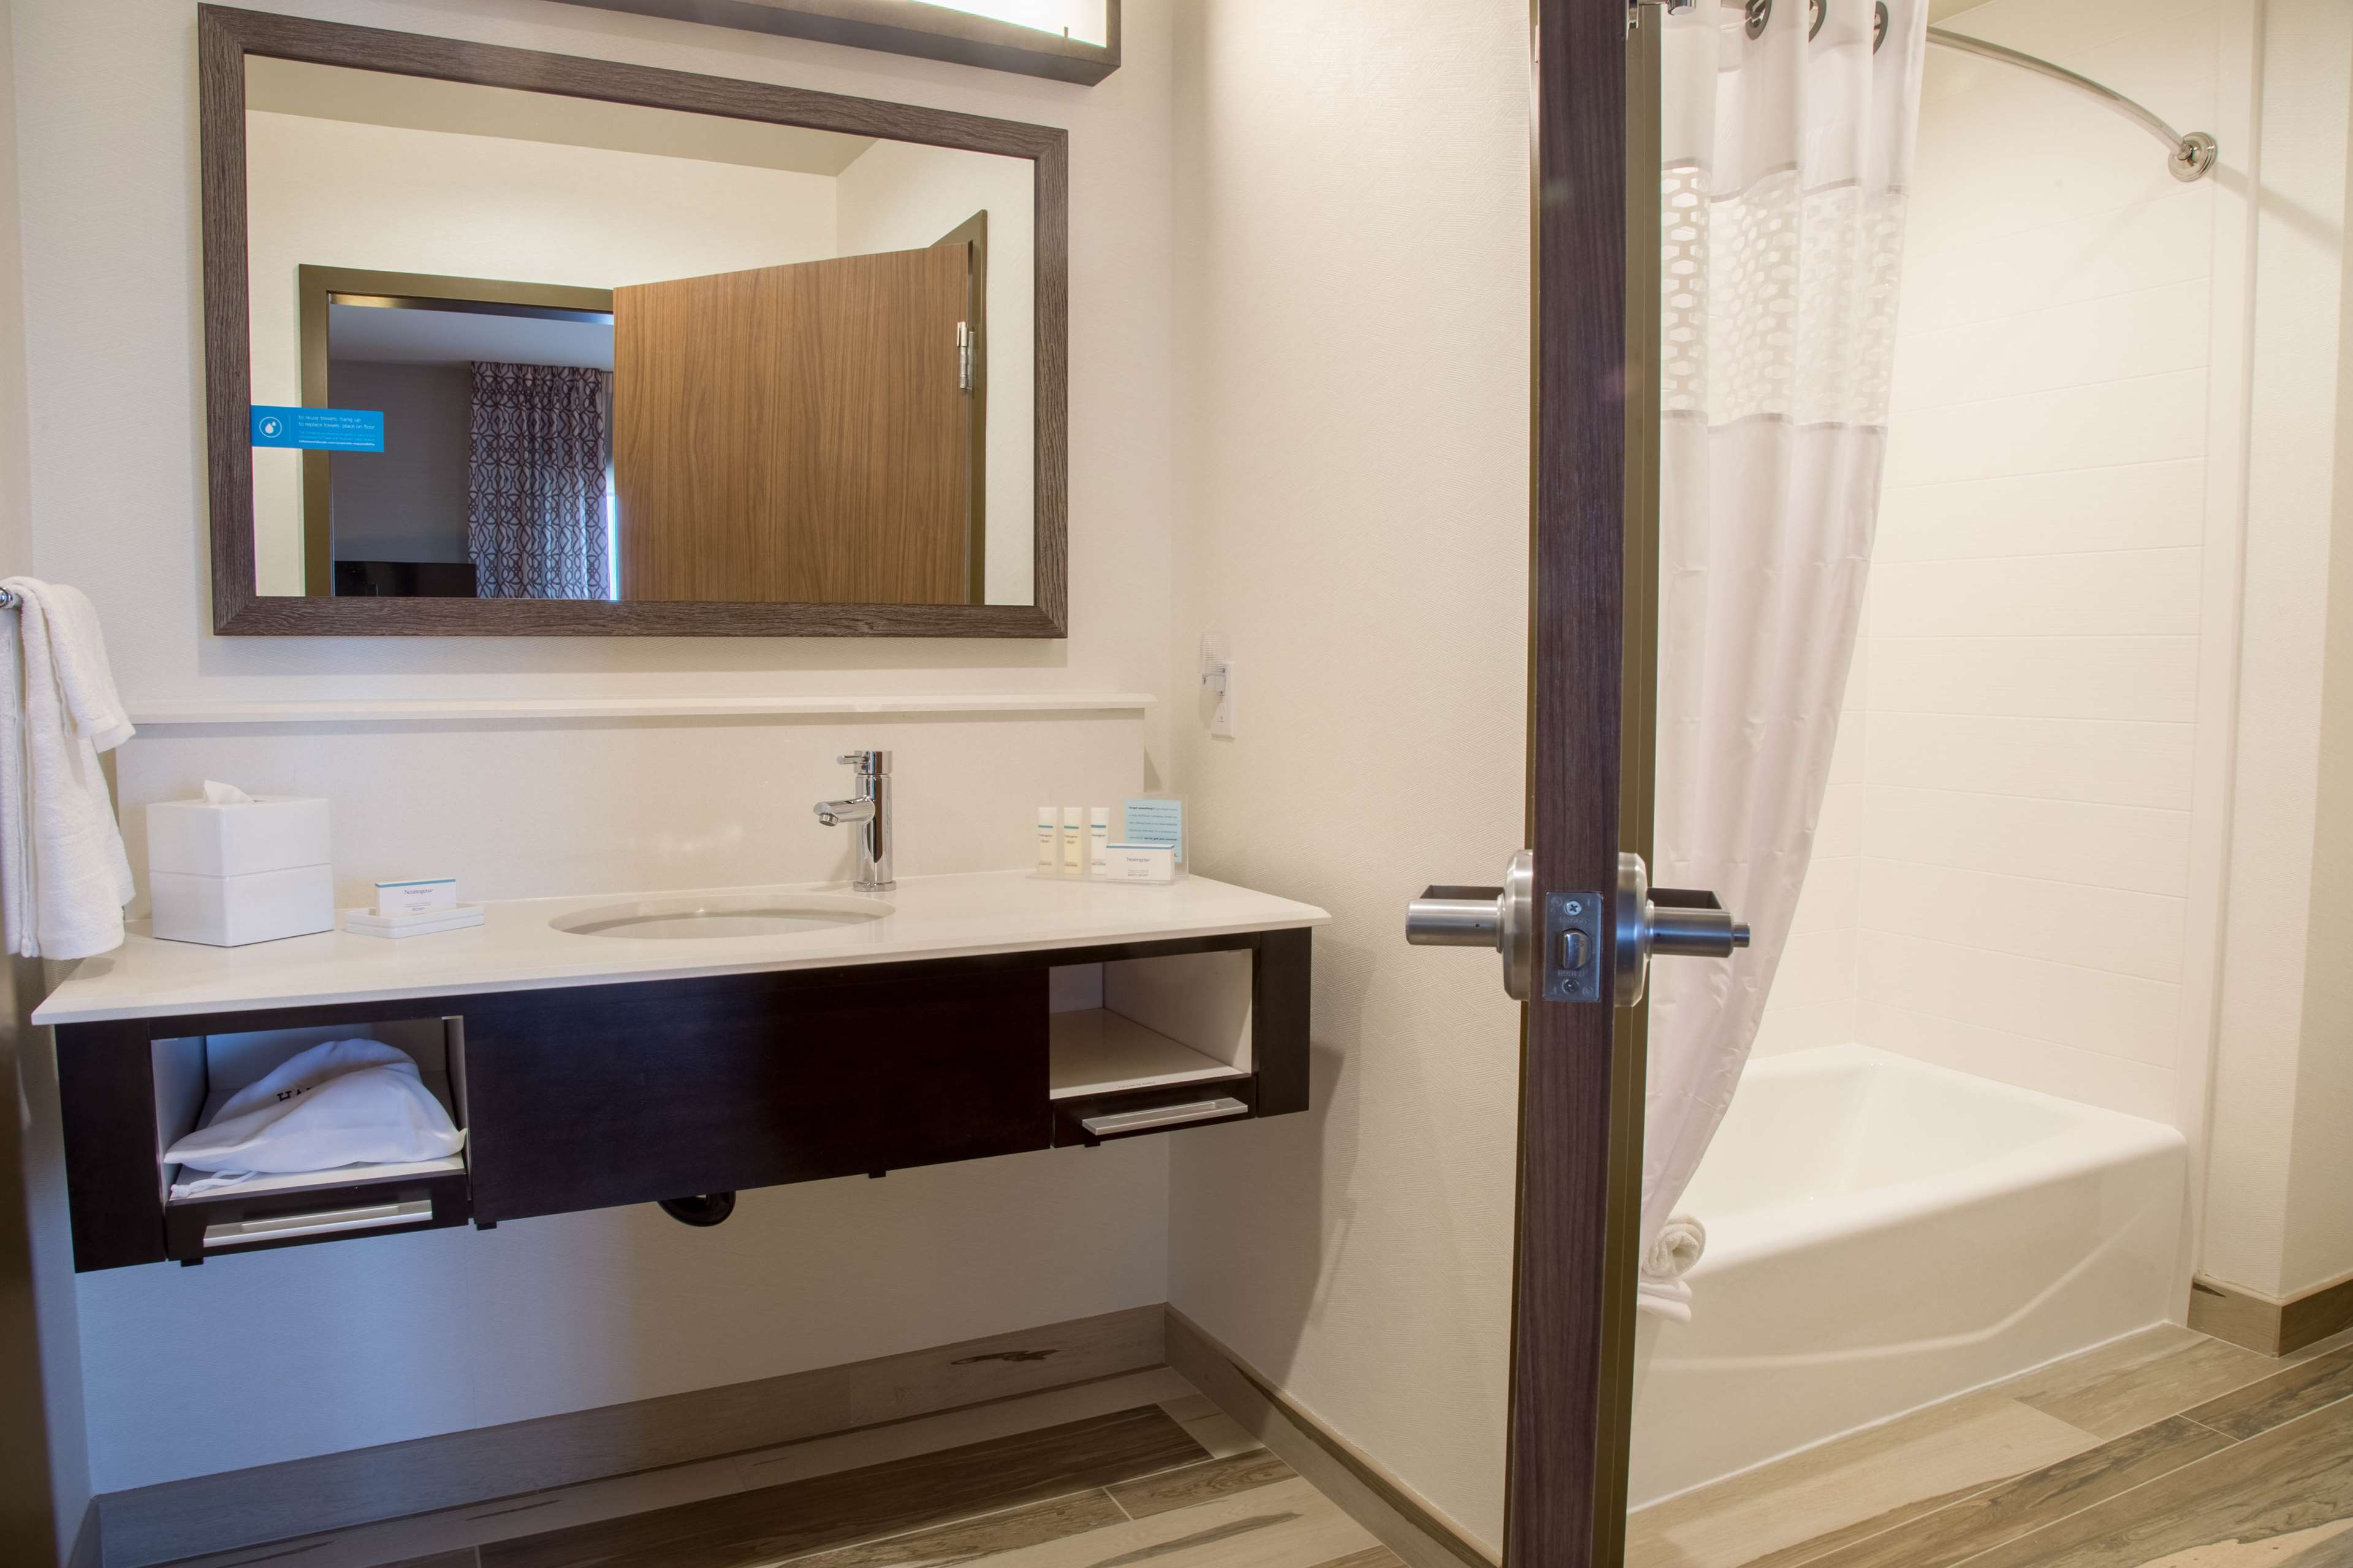 Hampton Inn & Suites Murrieta Temecula image 21